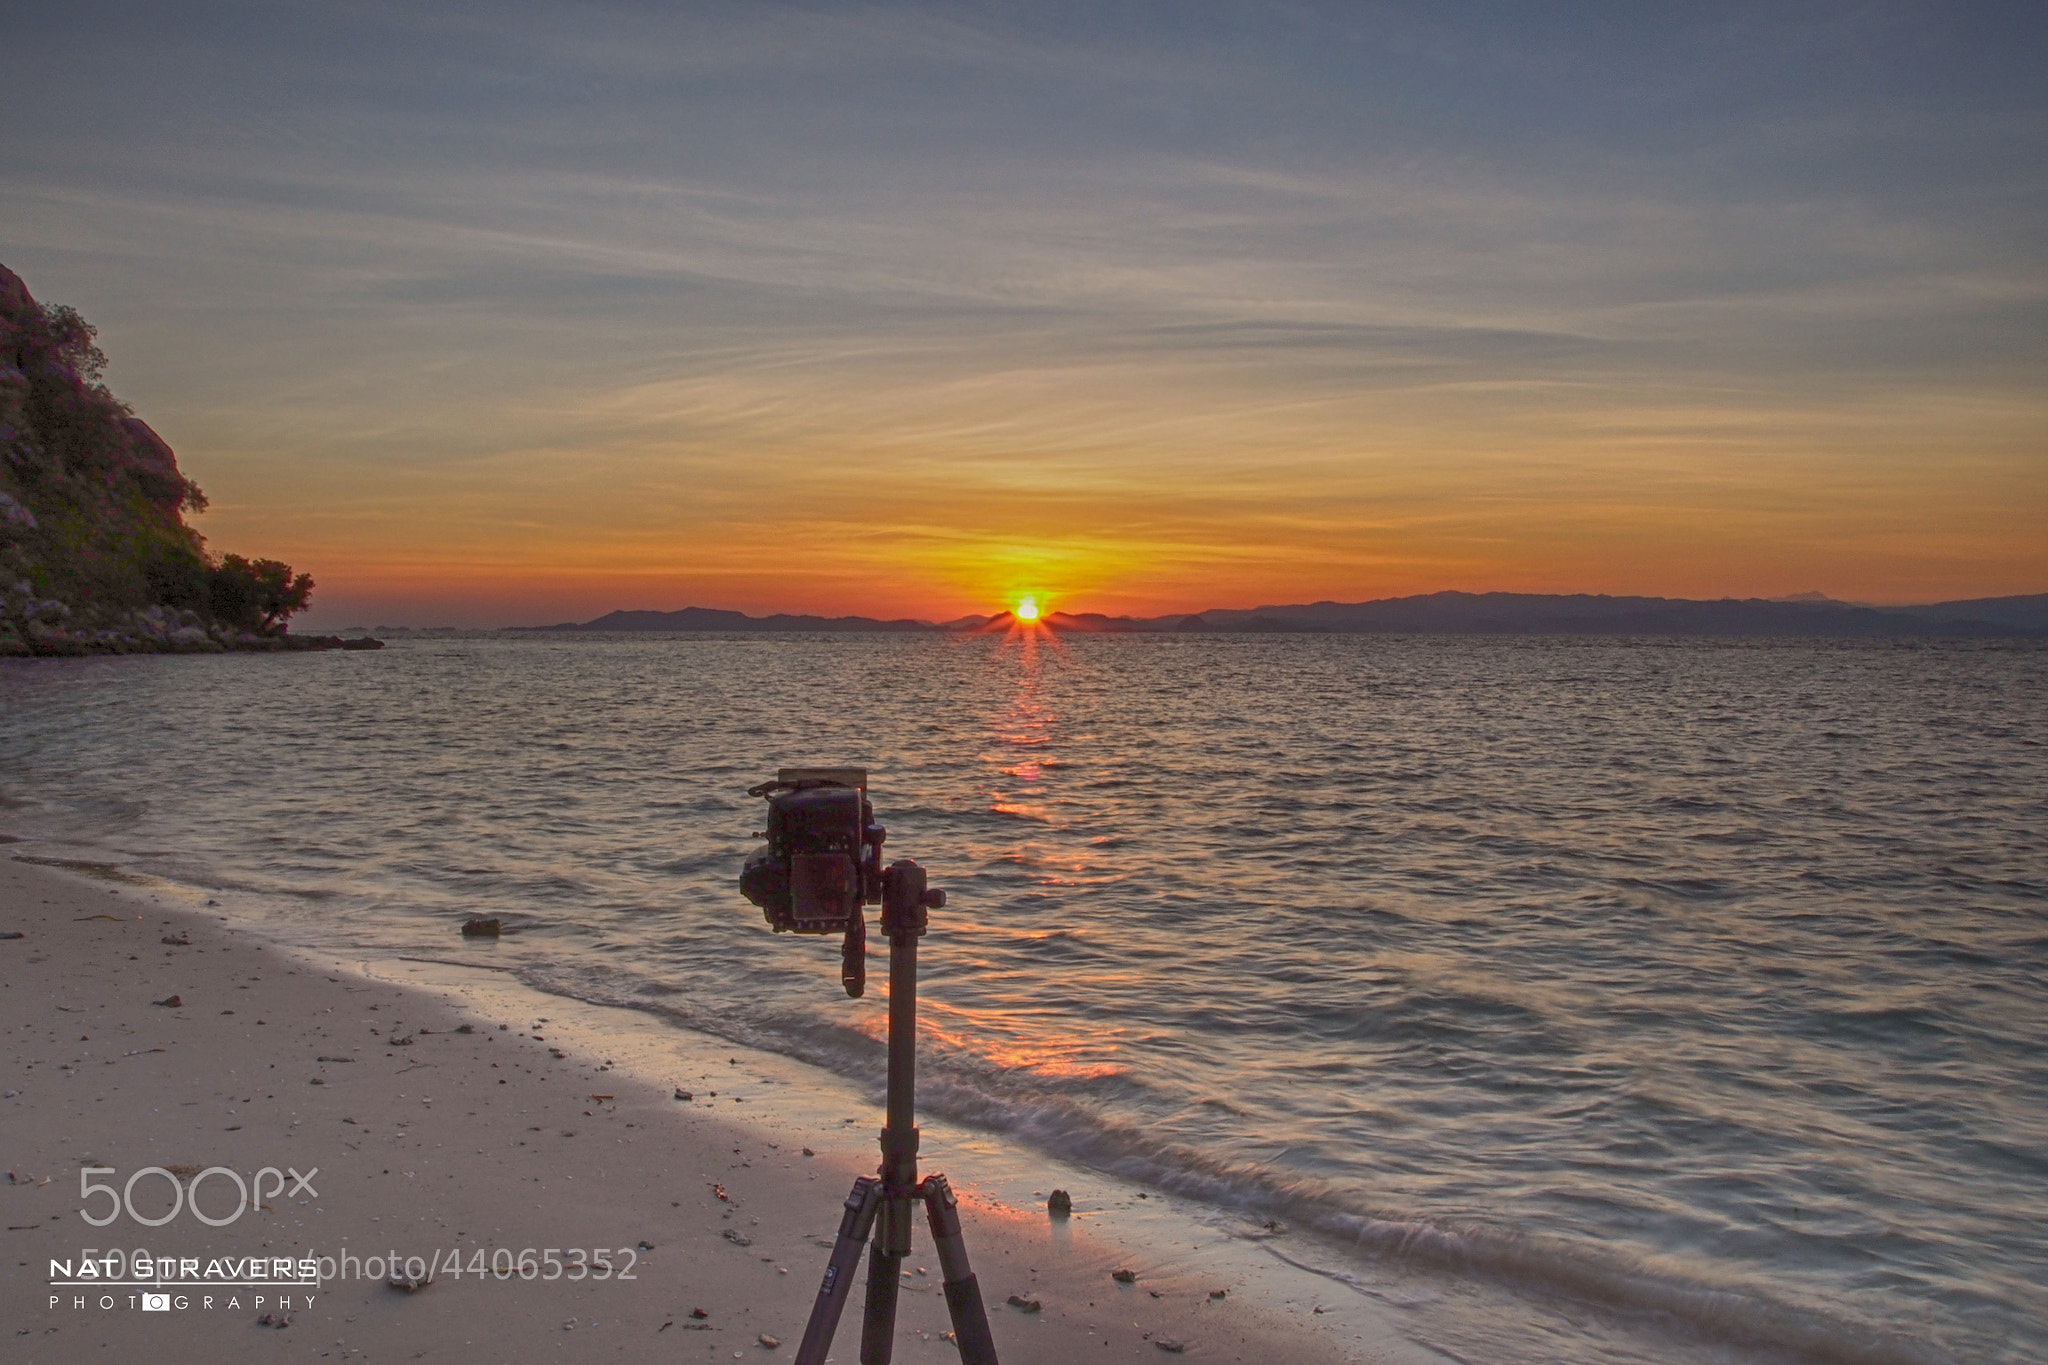 Photograph Kanawa sunrise by Nathalie Stravers on 500px